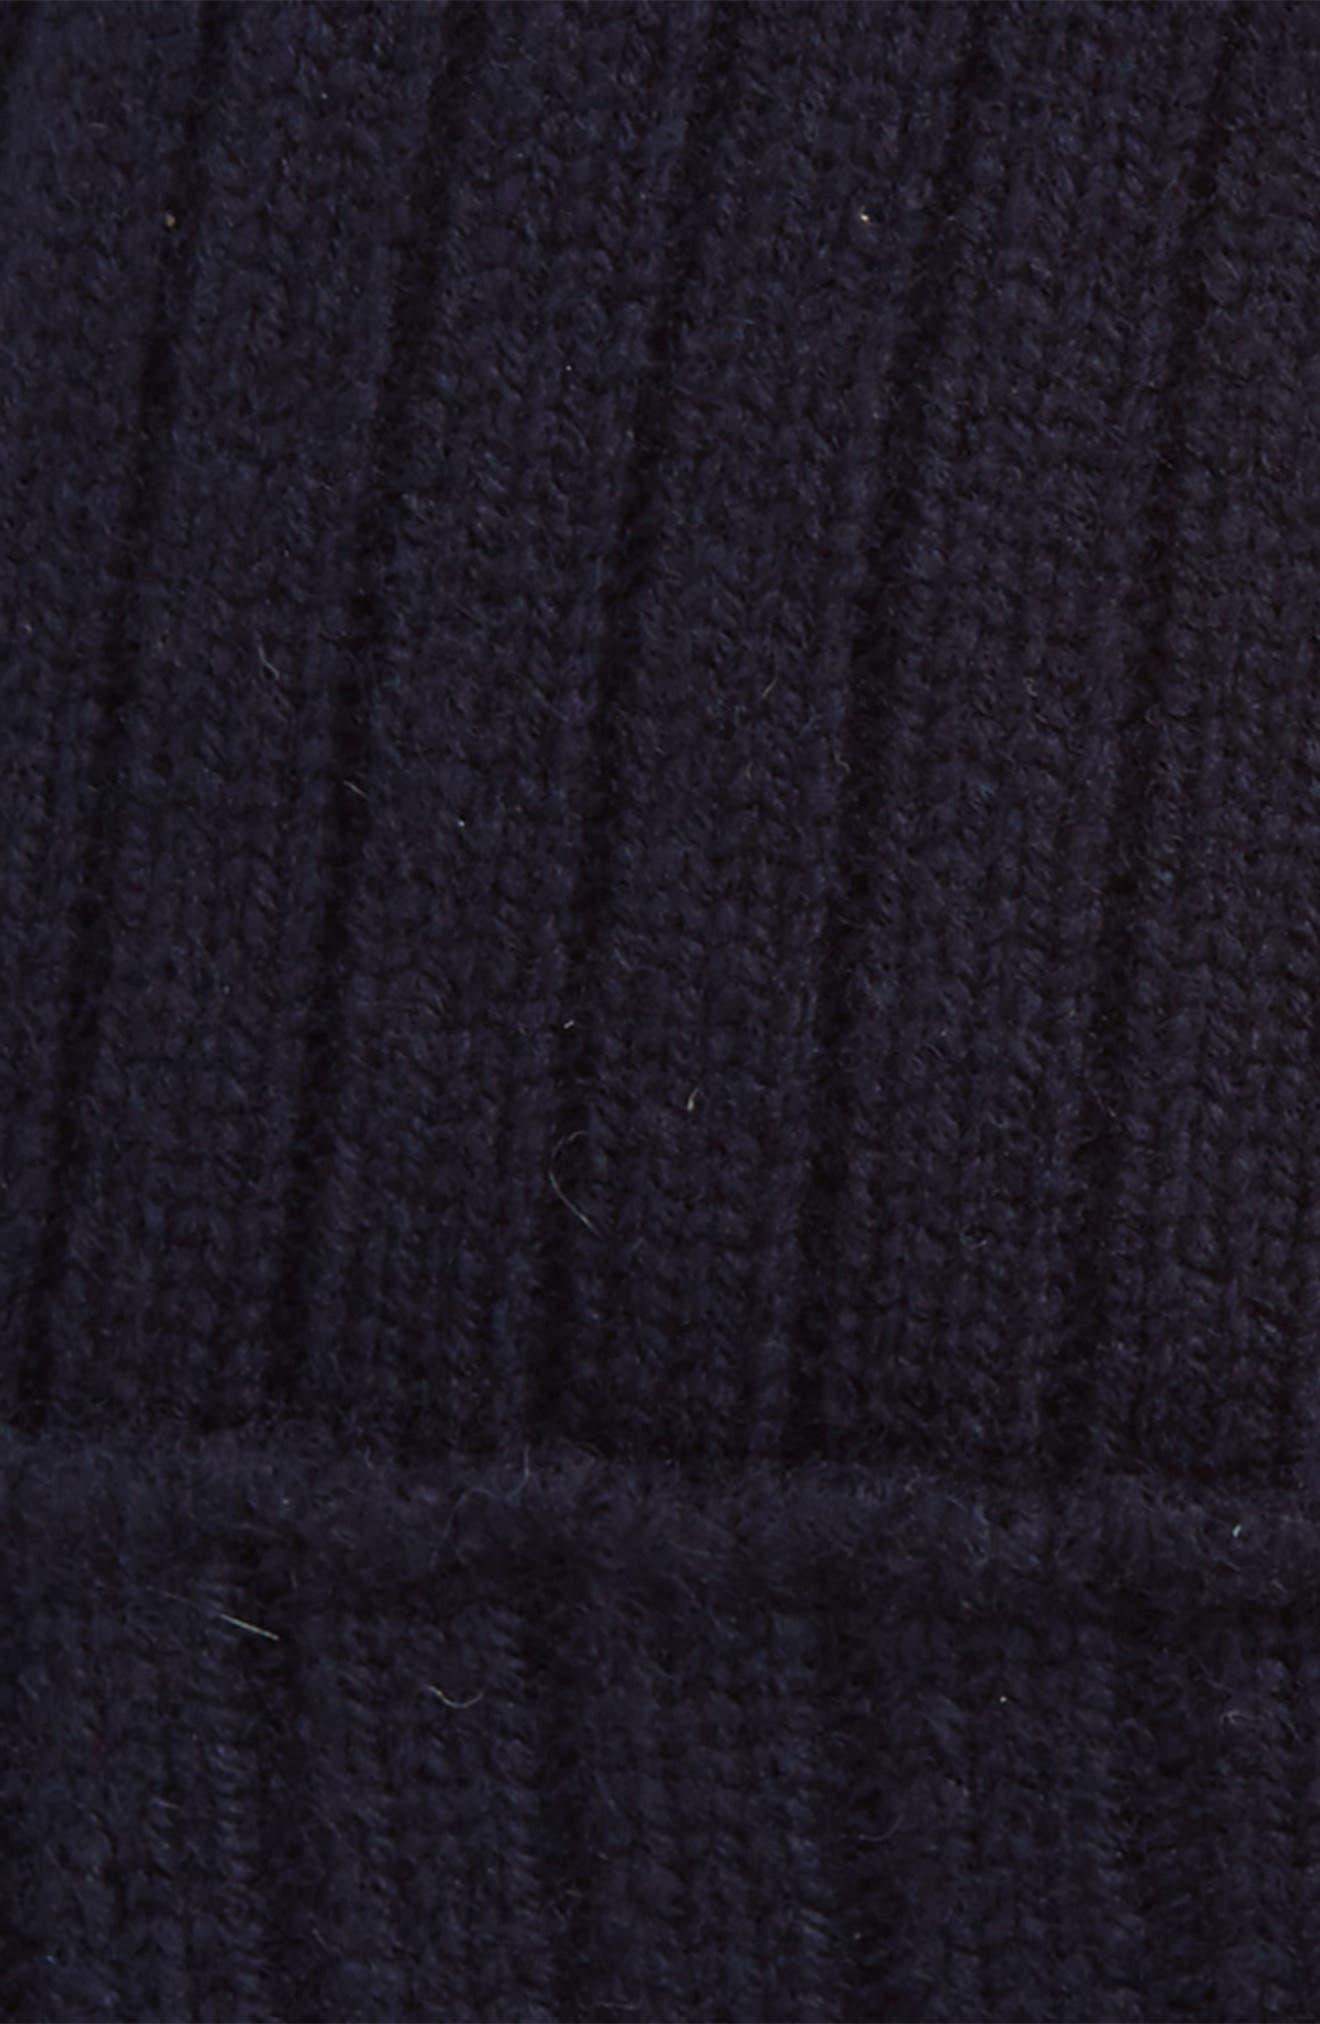 Wool Knit Cap,                             Alternate thumbnail 6, color,